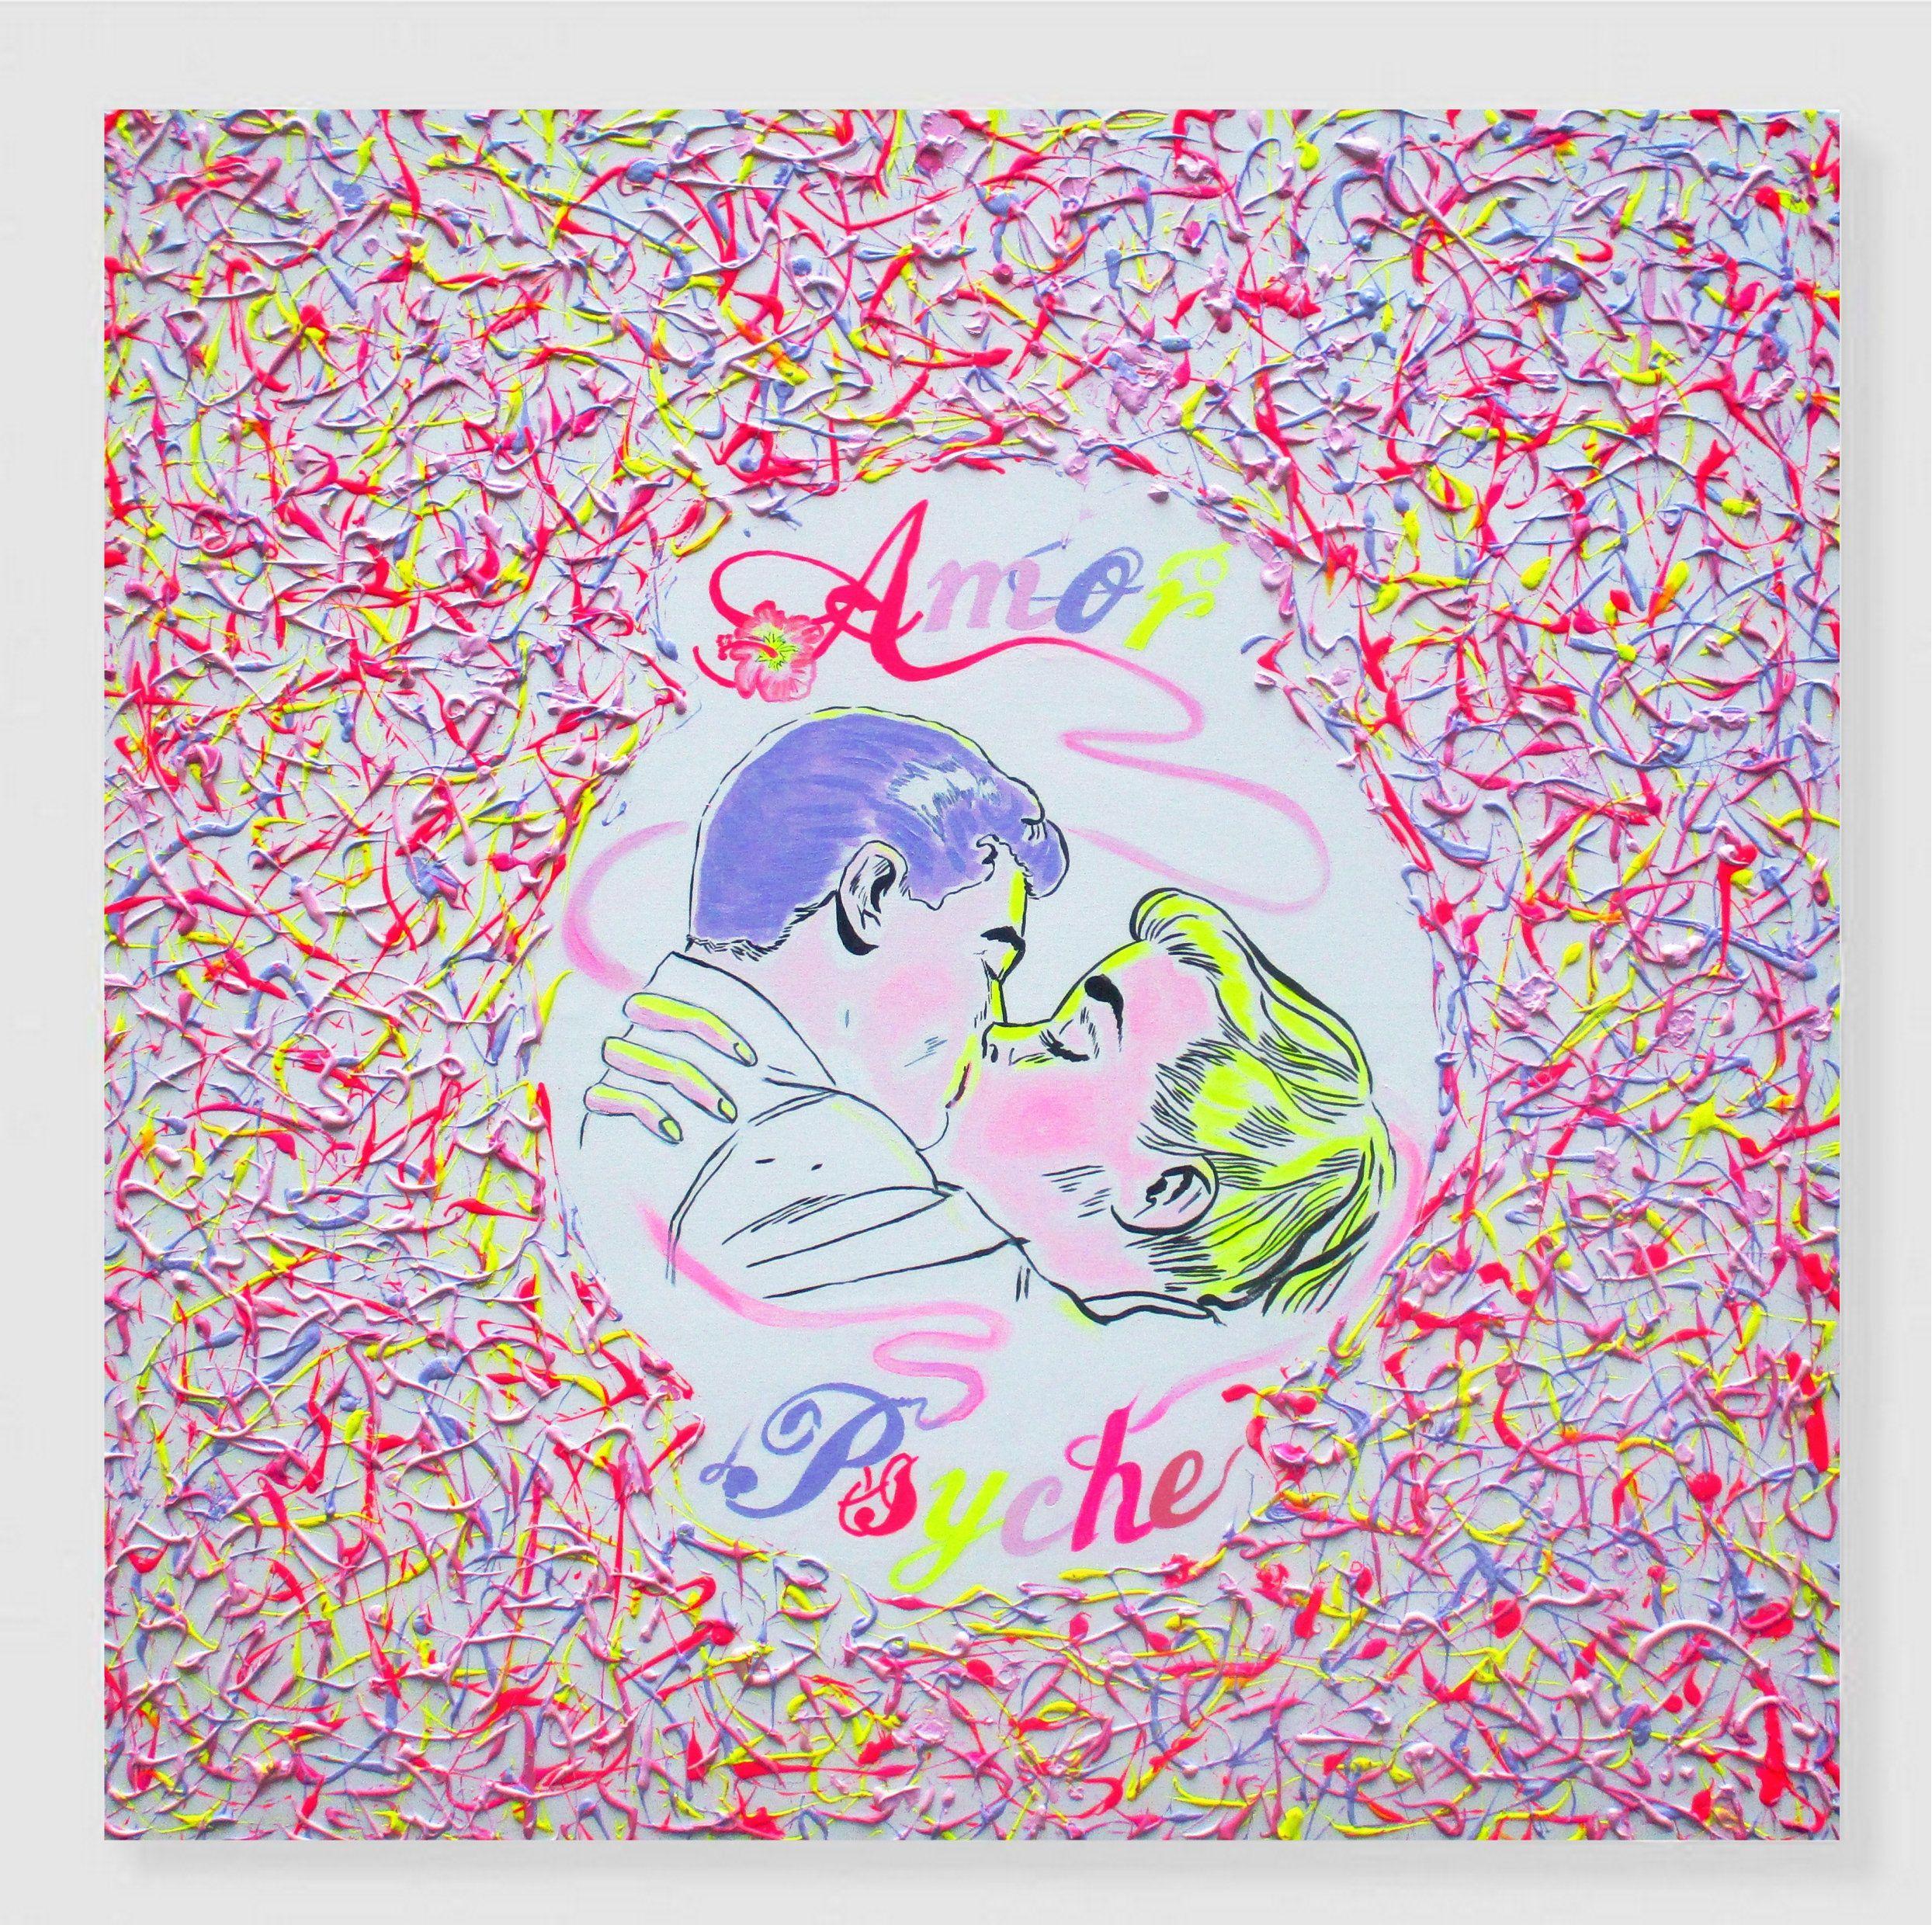 Abstraktes Buntes Gemälde Pink Pop Art Bild Quadratisches Etsy Artpop Pop Art Kunstmalerei